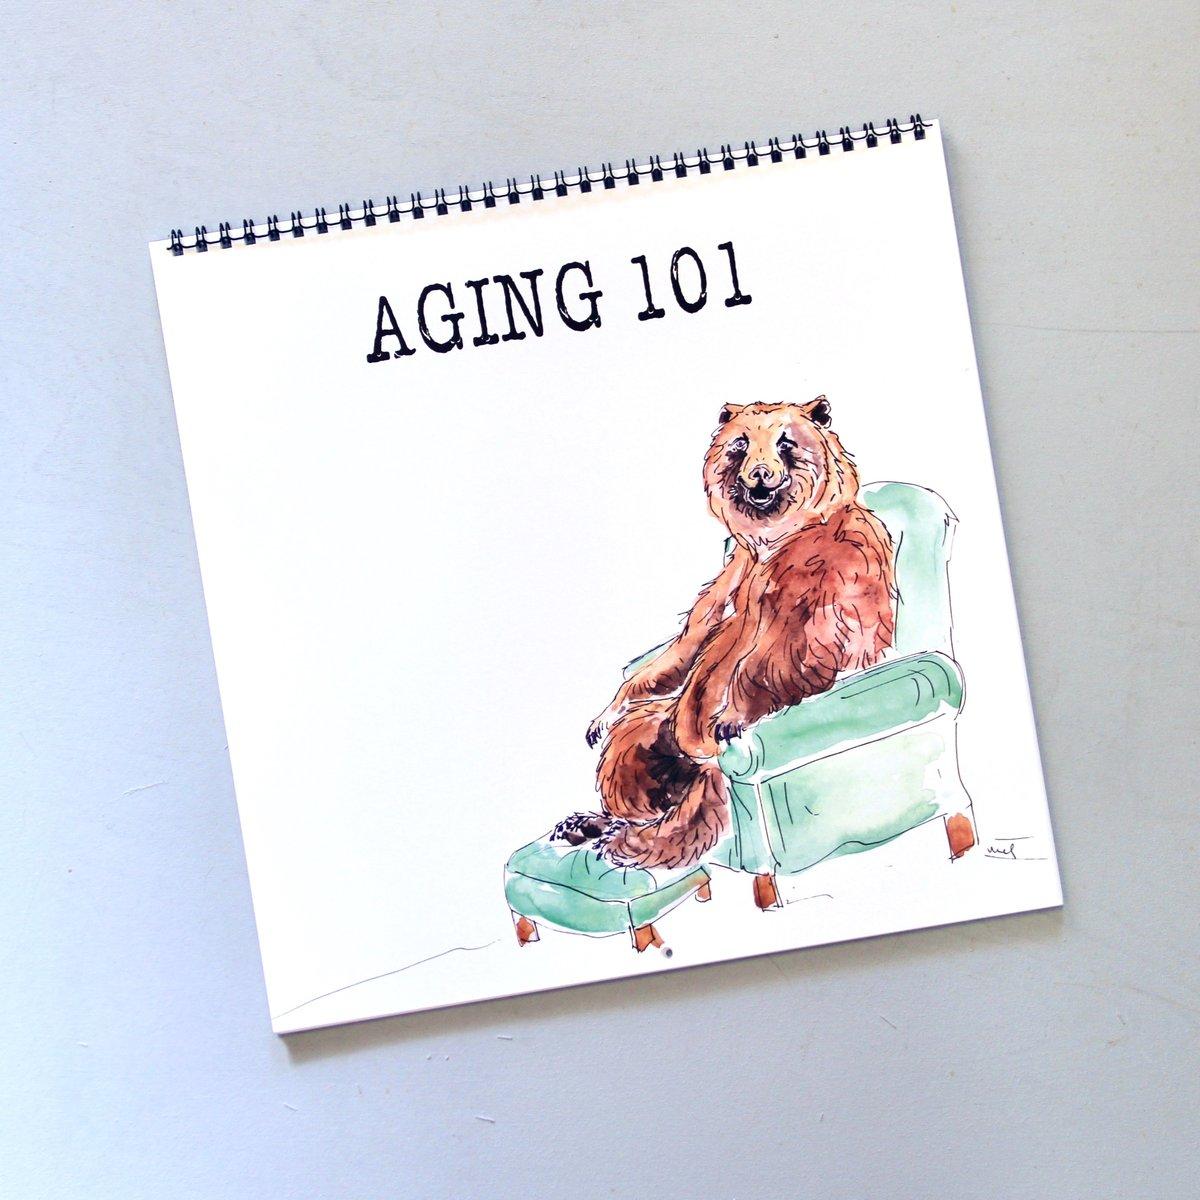 Image of Aging 101 Wall Calendar